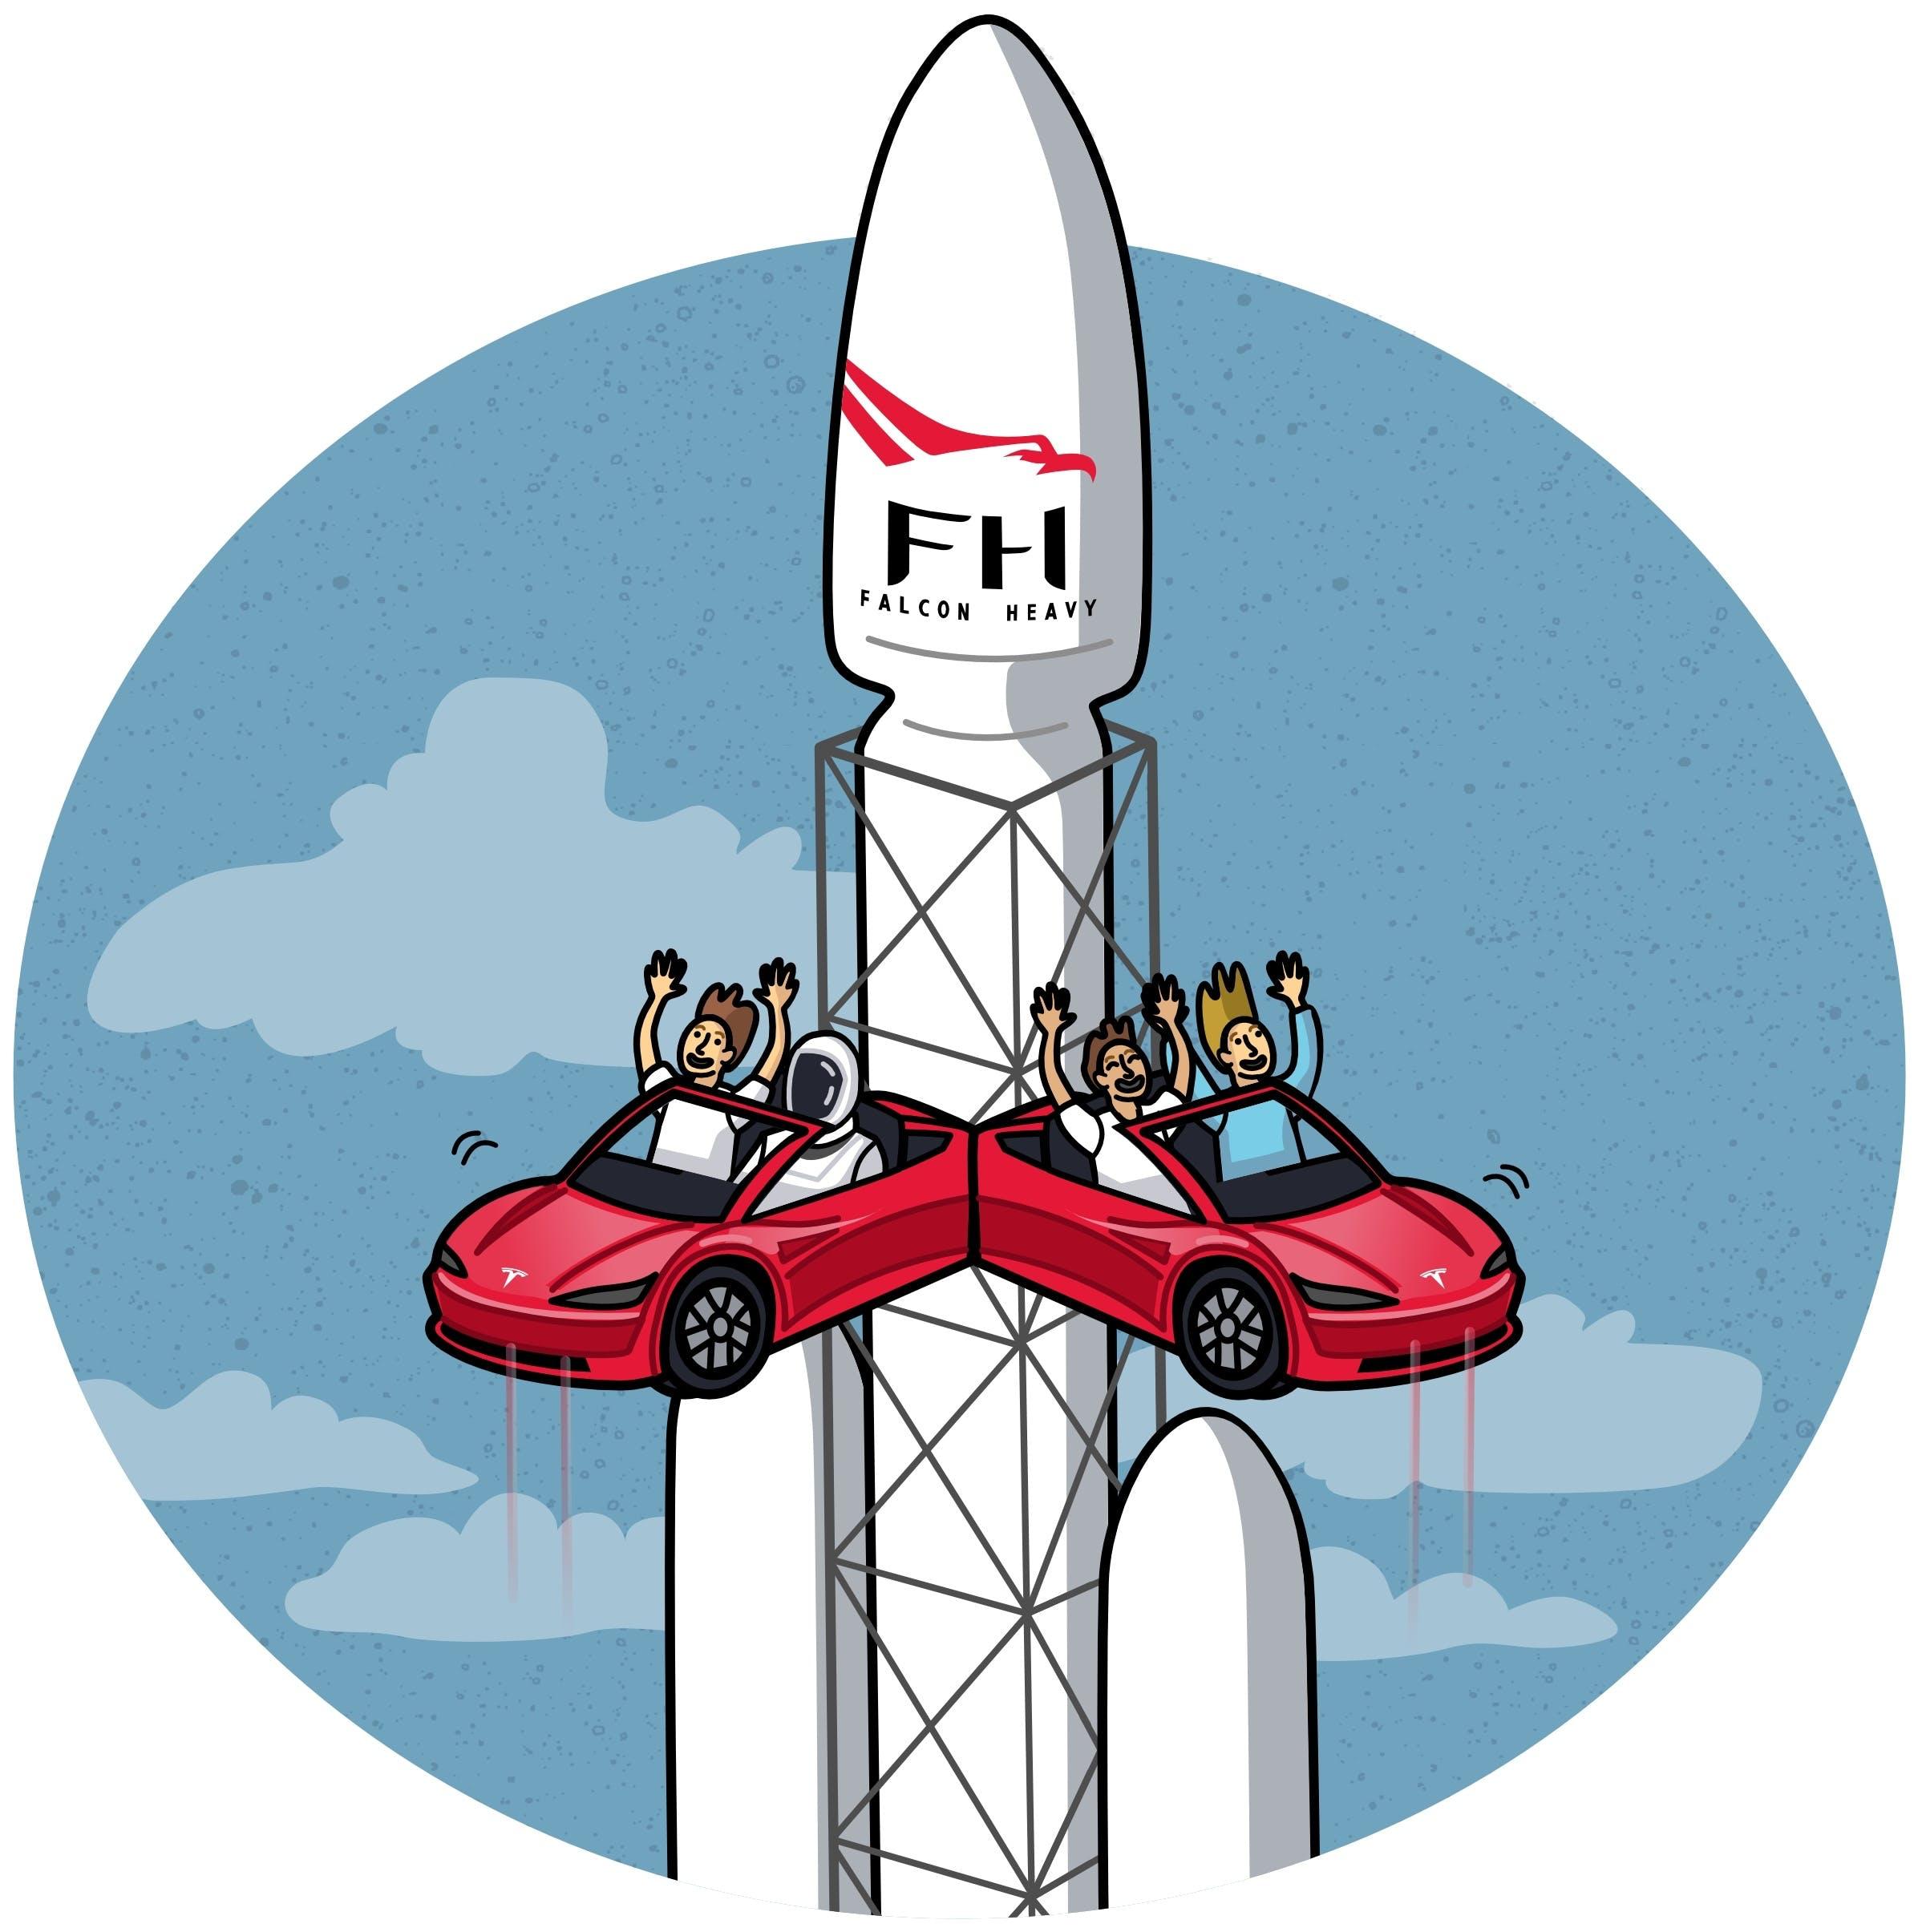 spacex rocket lanuch slingshot ride